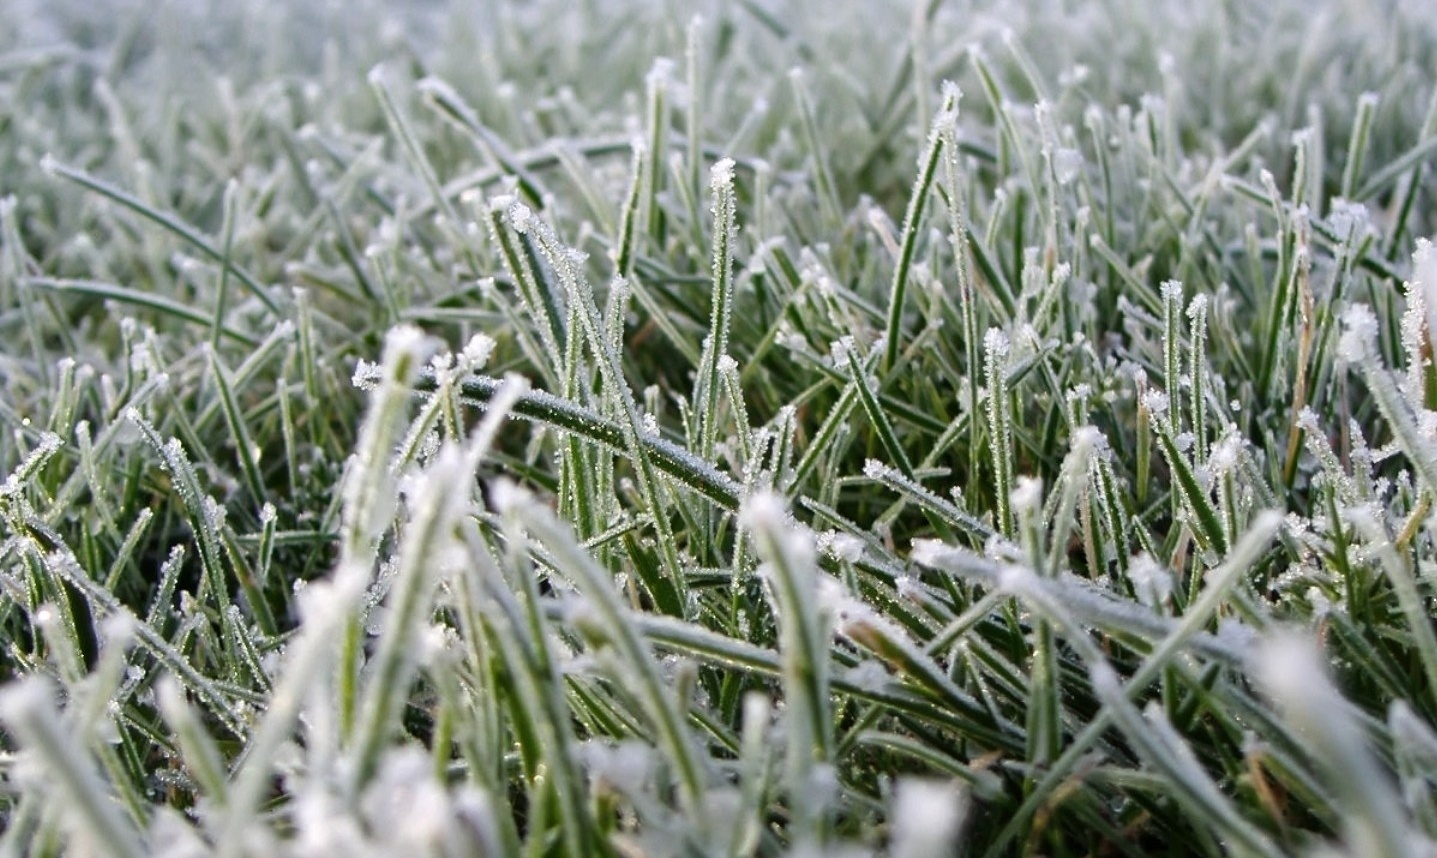 Весенние заморозки: когда наступят, защита от заморозков